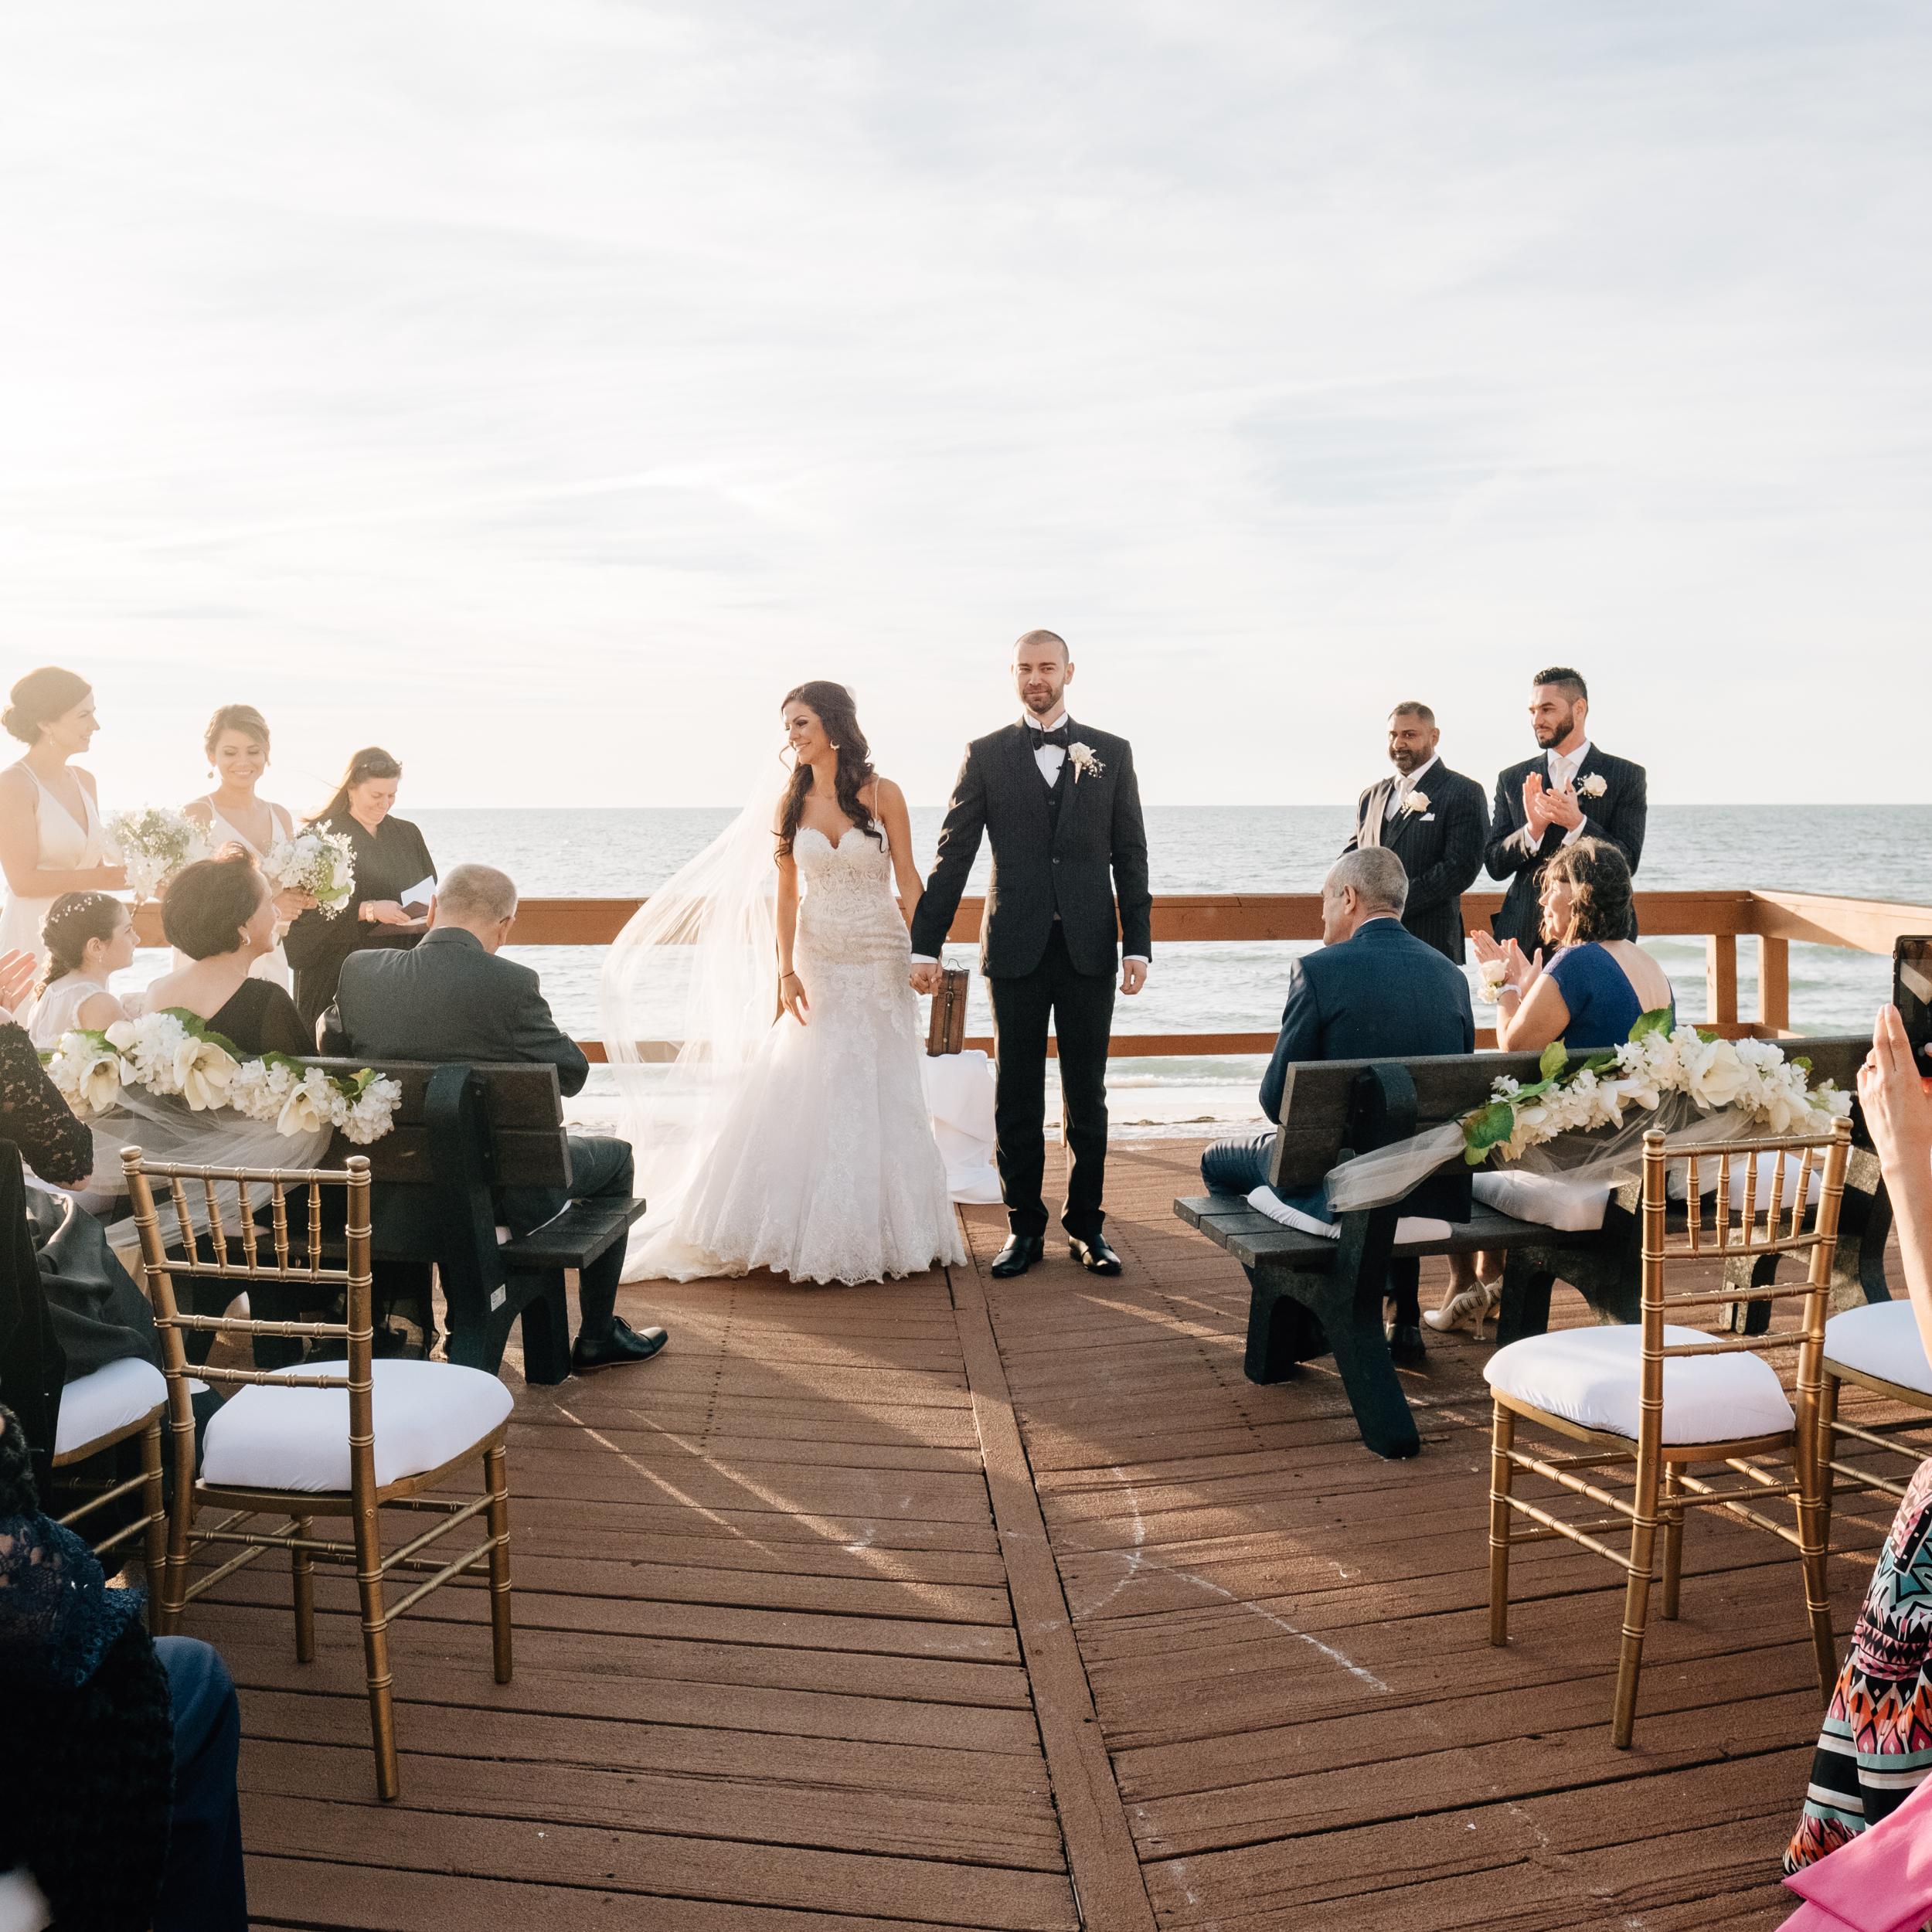 Amethyst Weddings - Georgi and Mariana 065.jpg